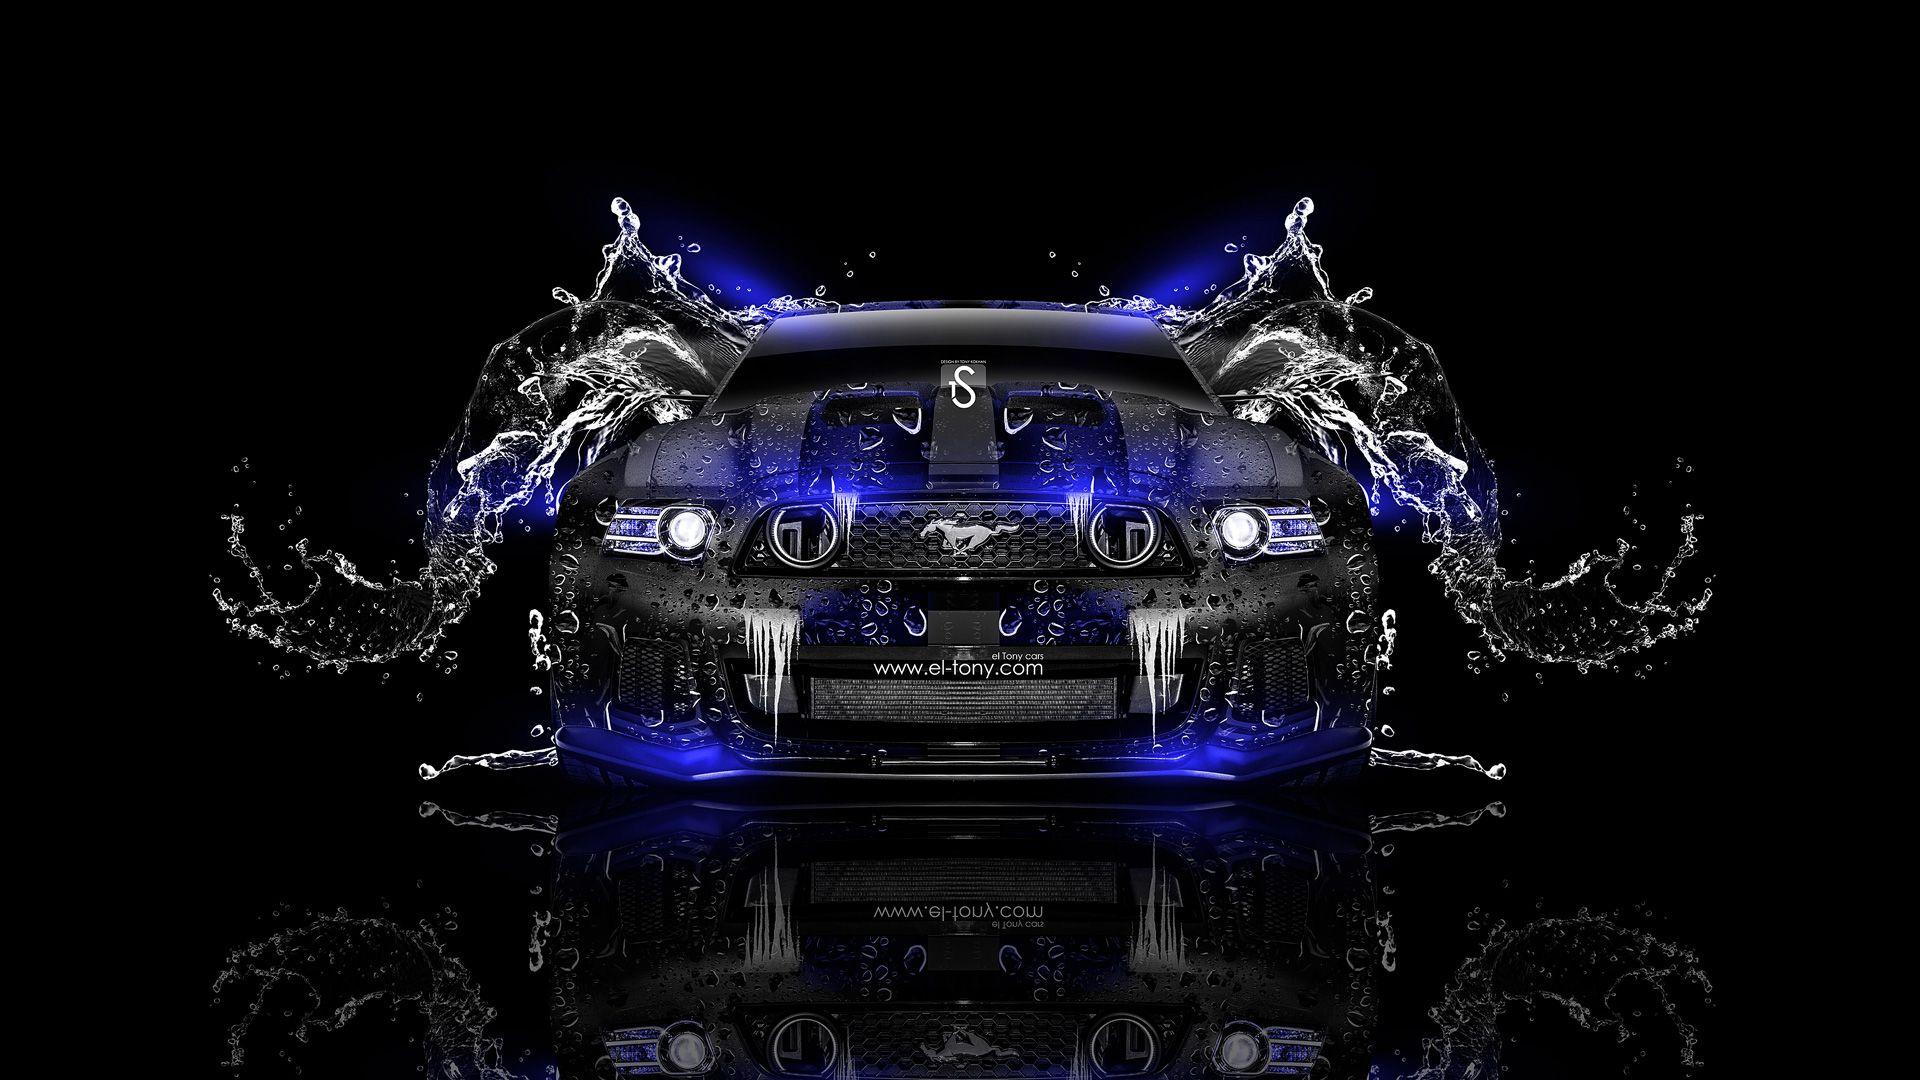 Ford-Mustang-GT-Water-Car-2014-Blue-Neon-design-by-Tony-Kokhan-www.el-tony.com_.jpg (1920×1080)